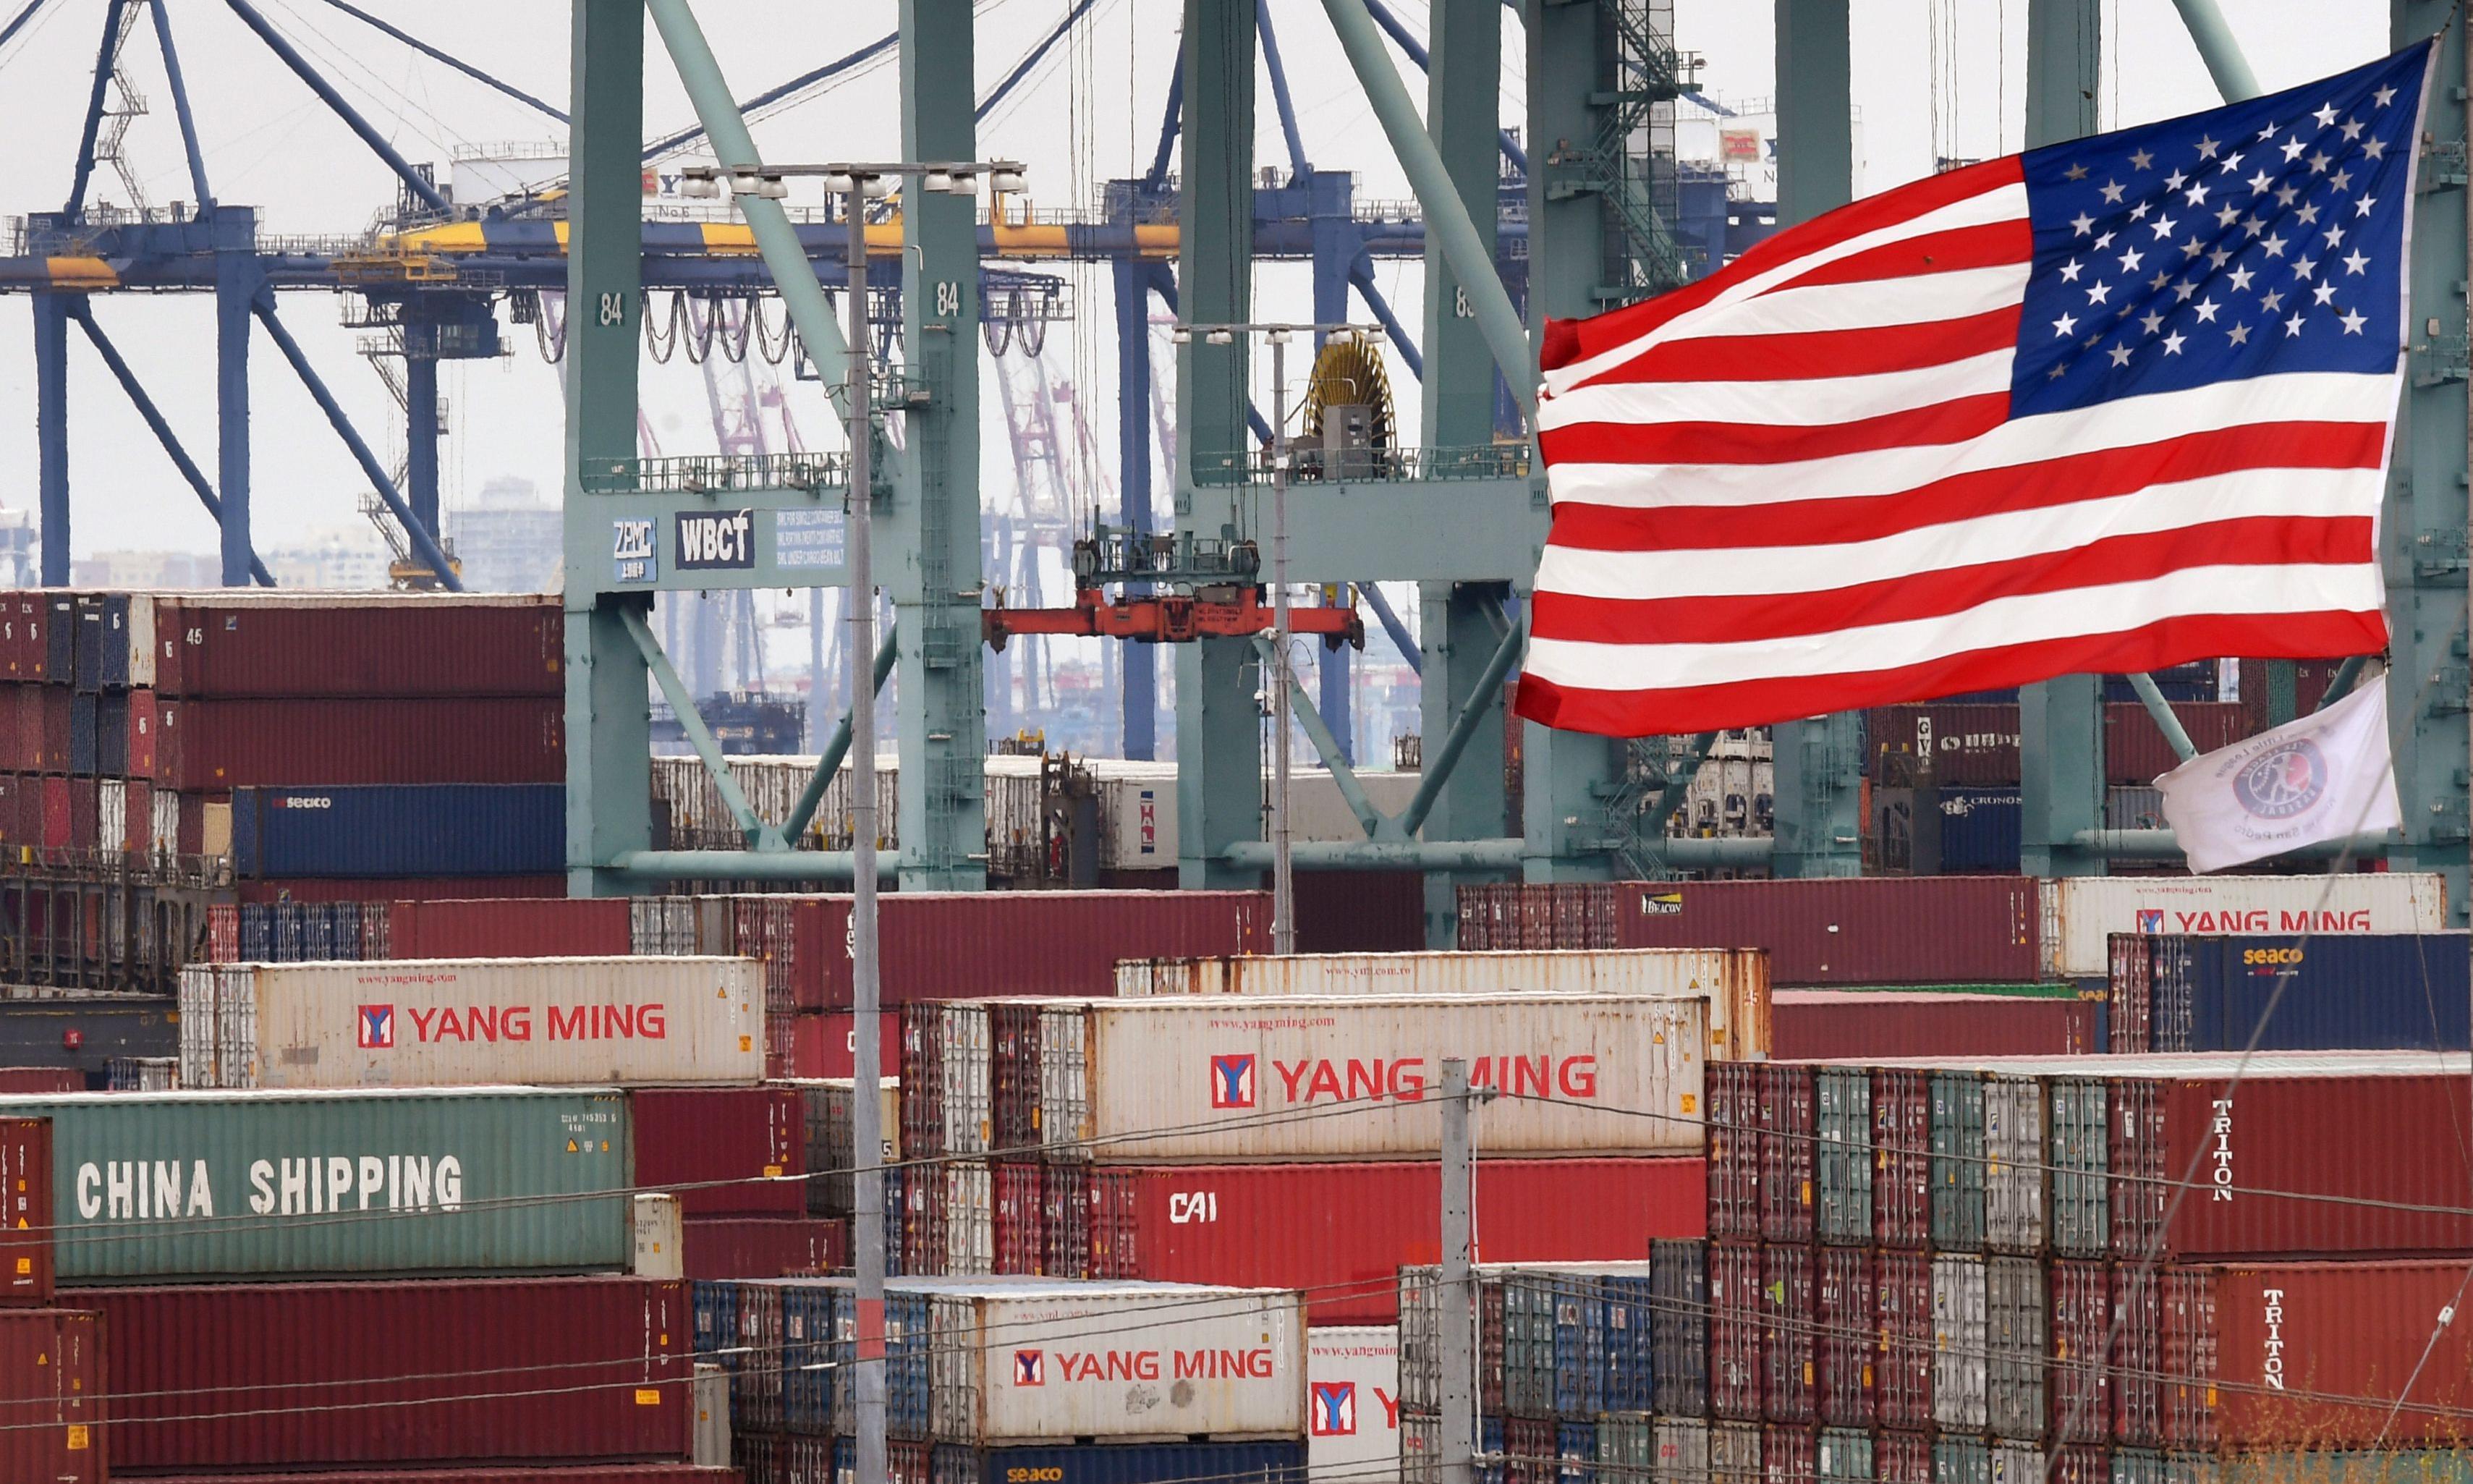 Trump's China trade war risks damaging US economy, says OECD